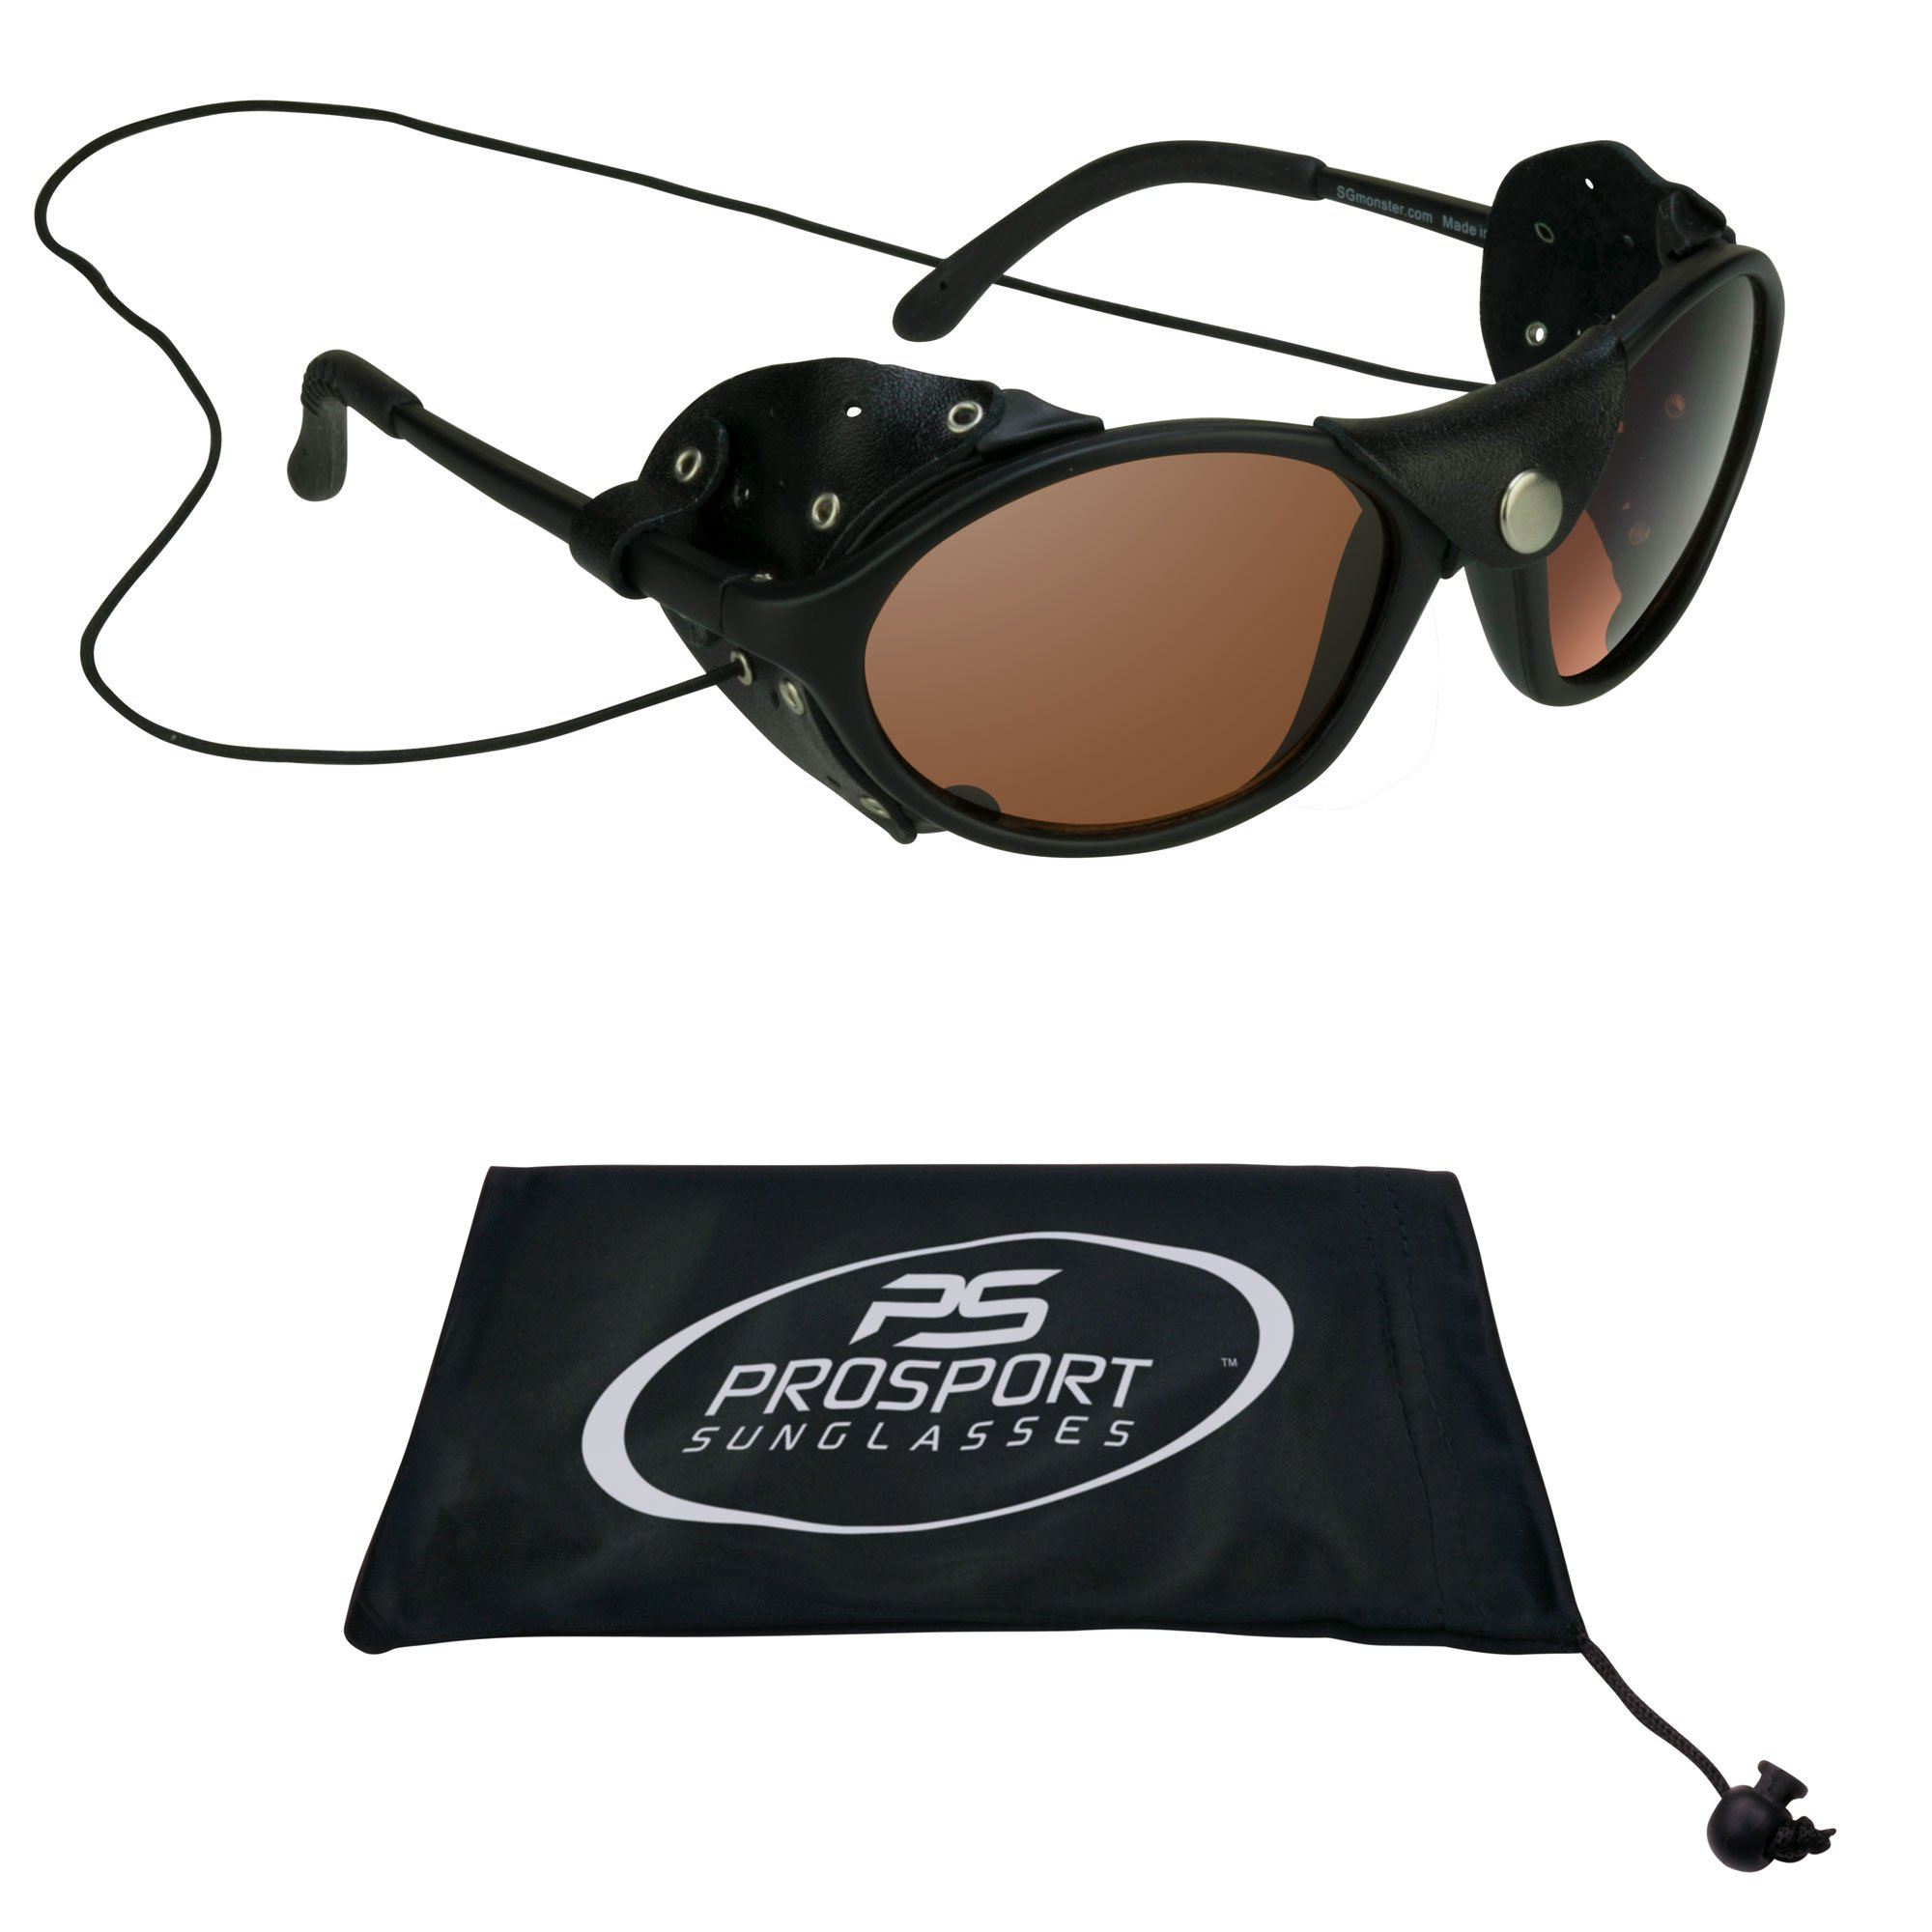 Glacier Sunglasses Leatherette Side Shields for Motorcycle Mountaineering Ski, HD Blue Bloker Lenses, Neck String